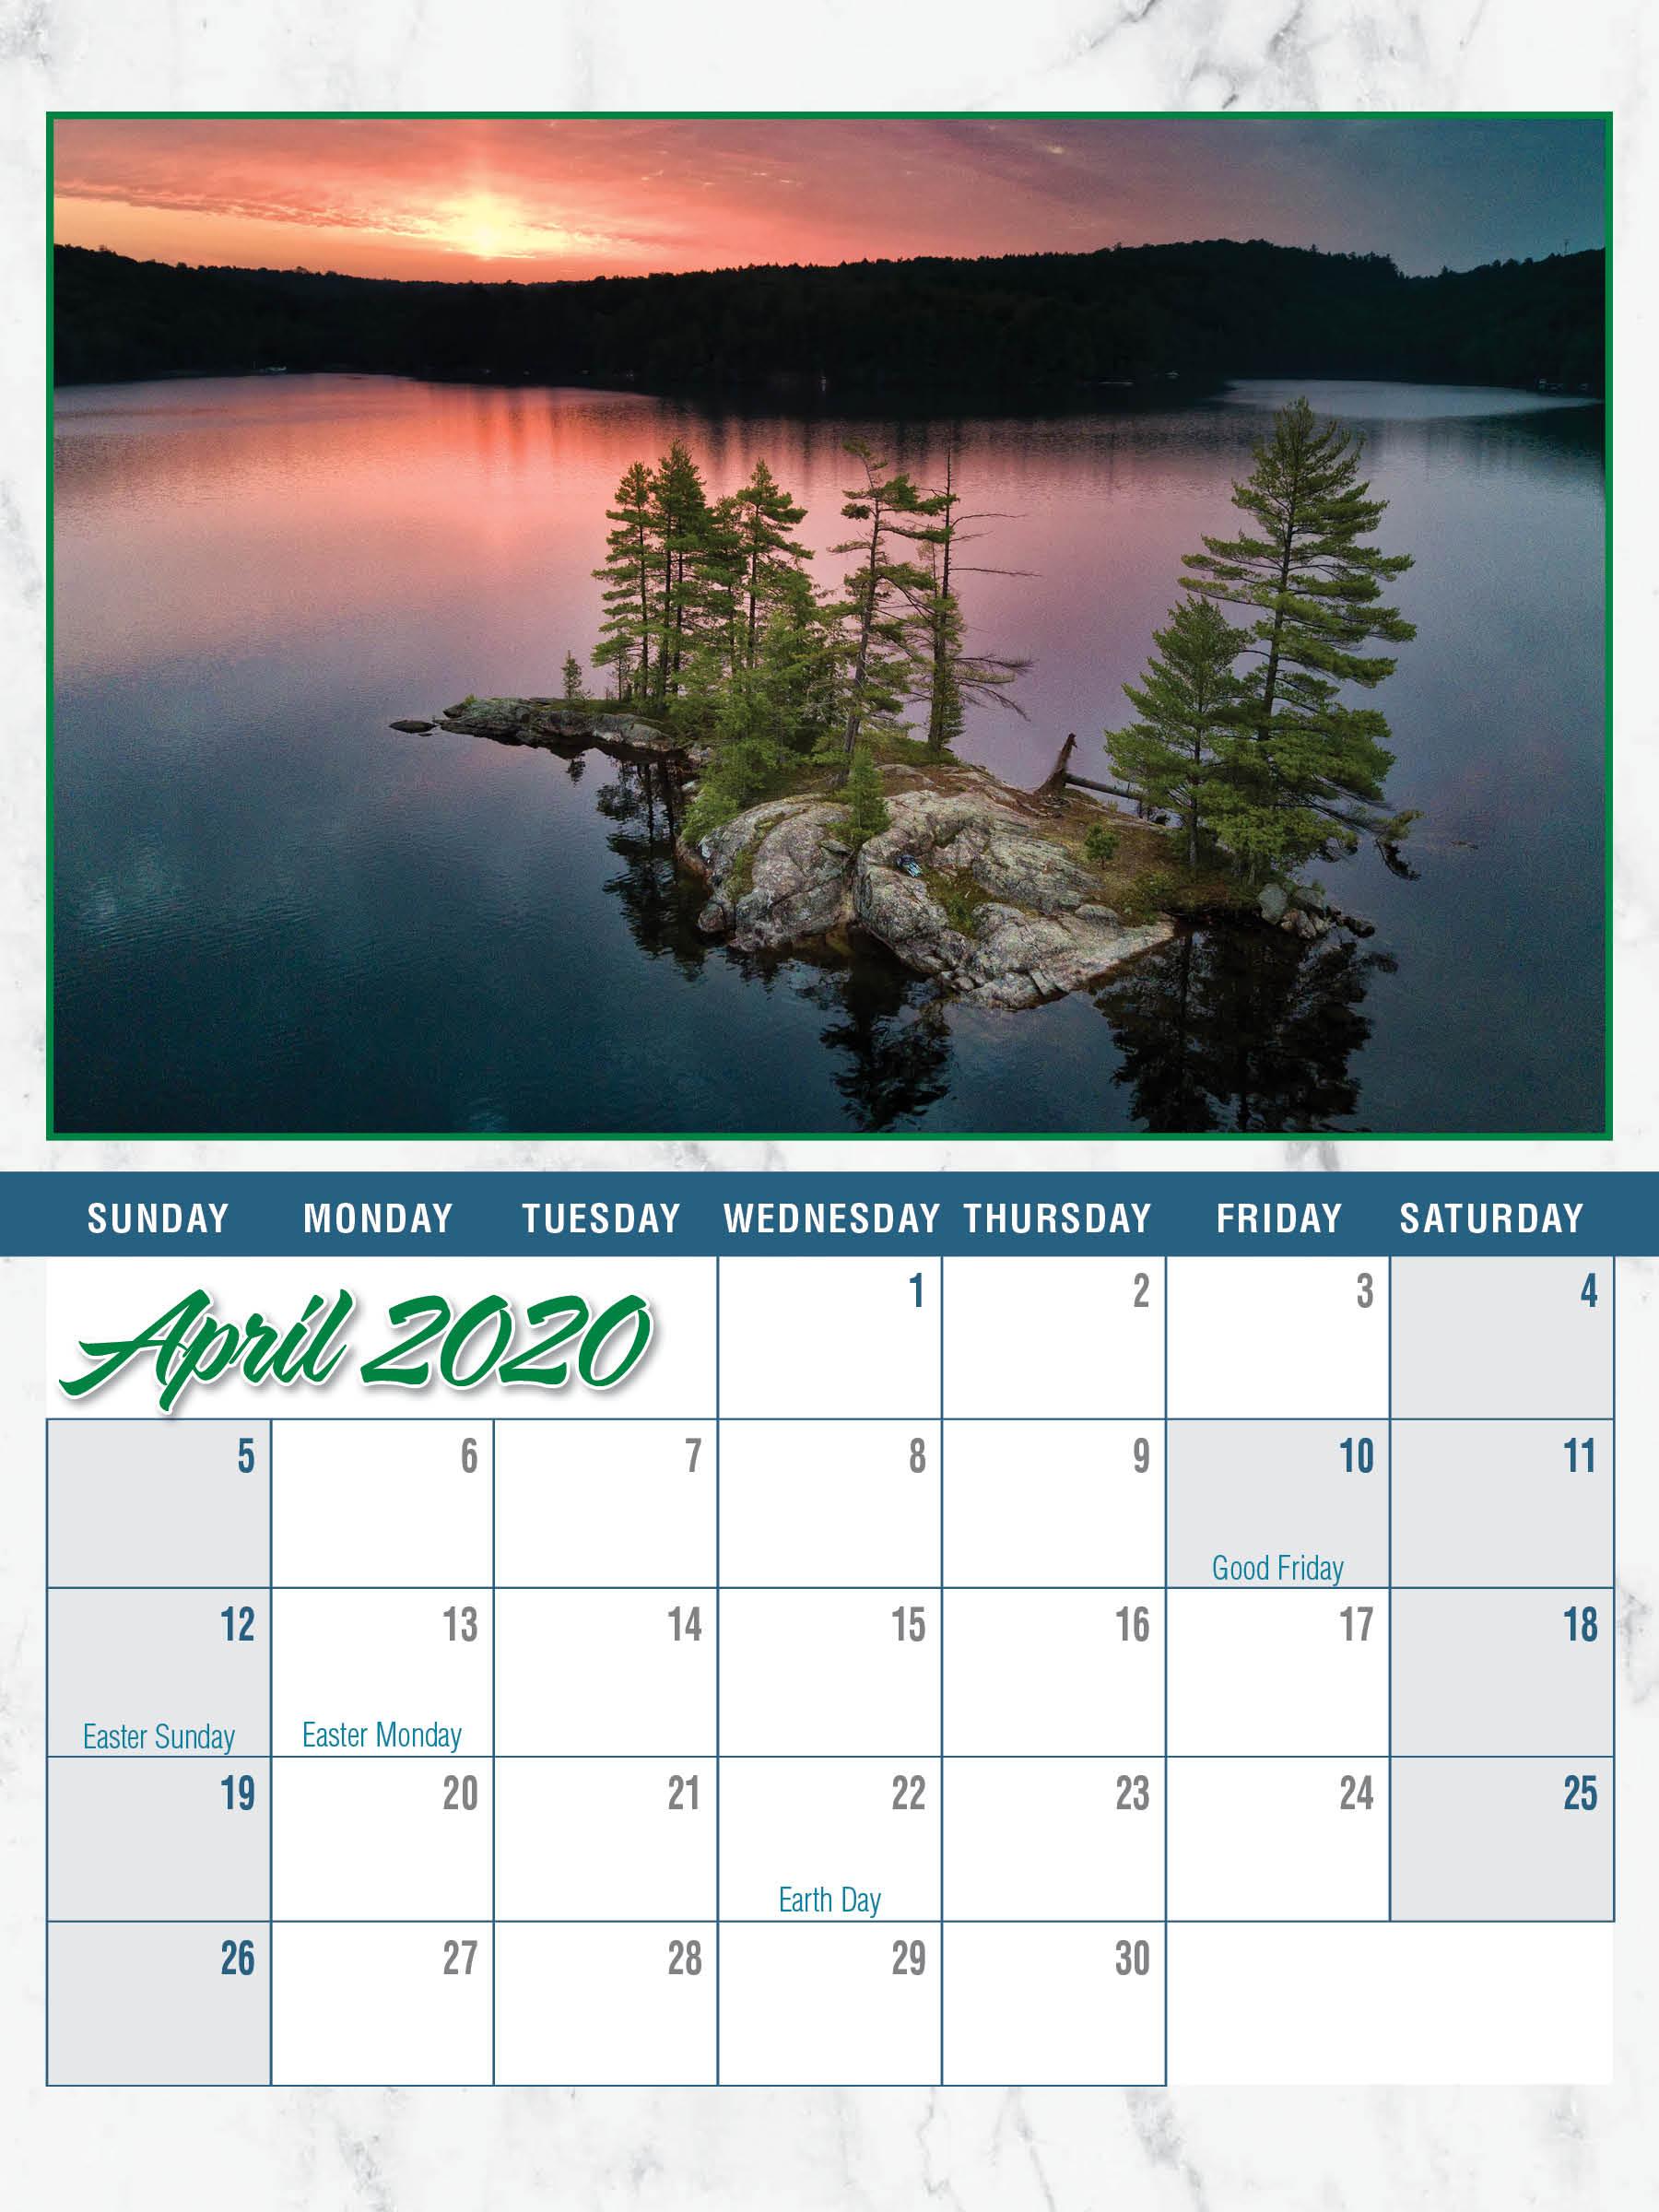 KLCOA Order your 2020 Calendars NOW!